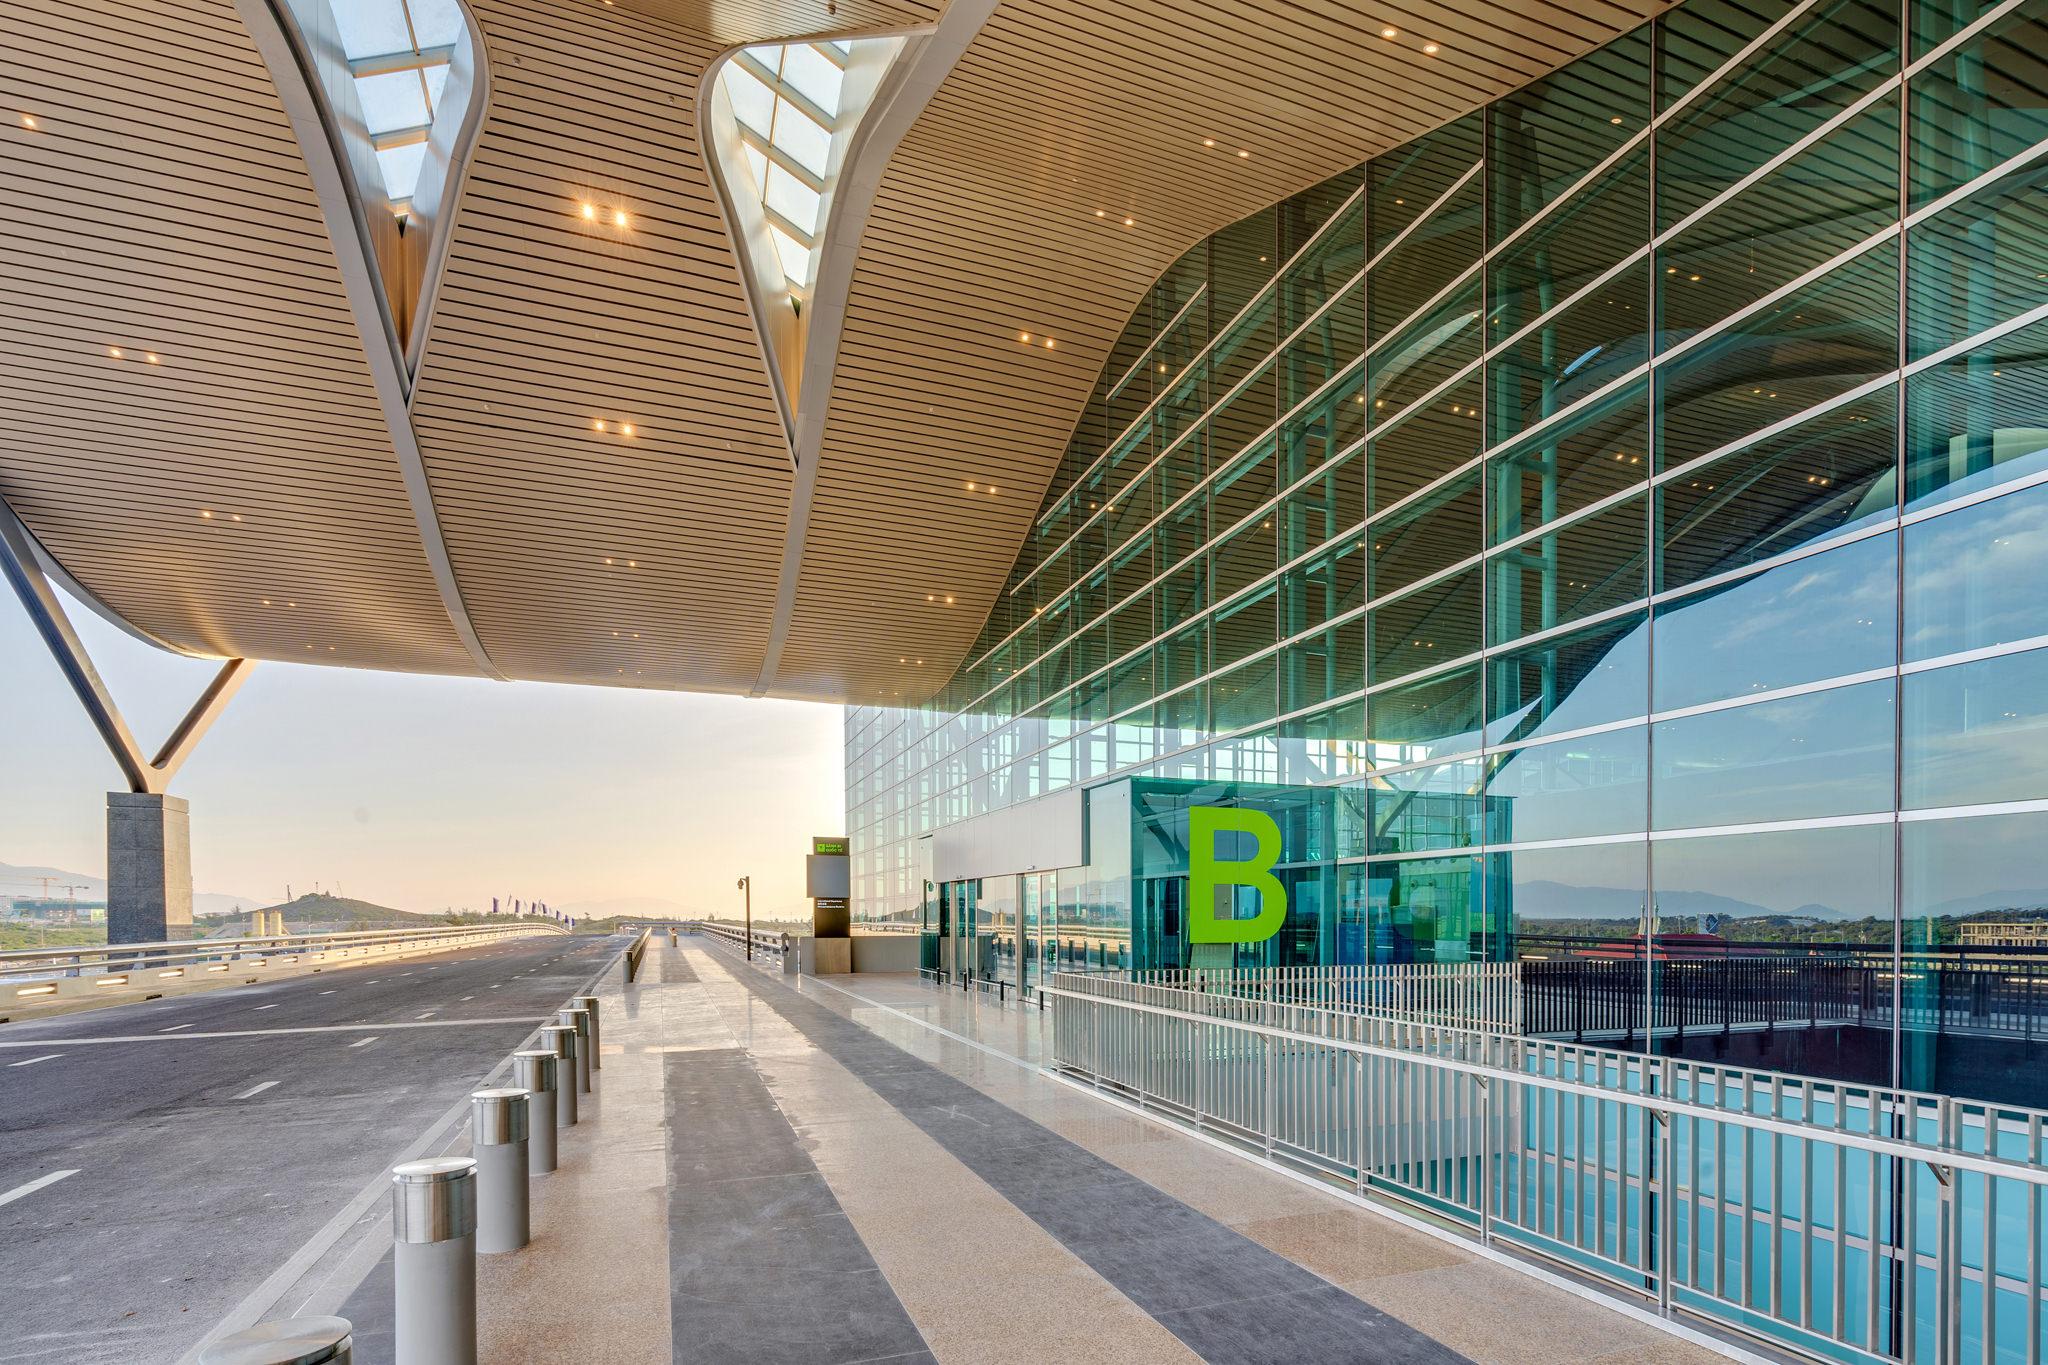 20180626 - Cam Ranh Airport - Architecture - 0056.jpg